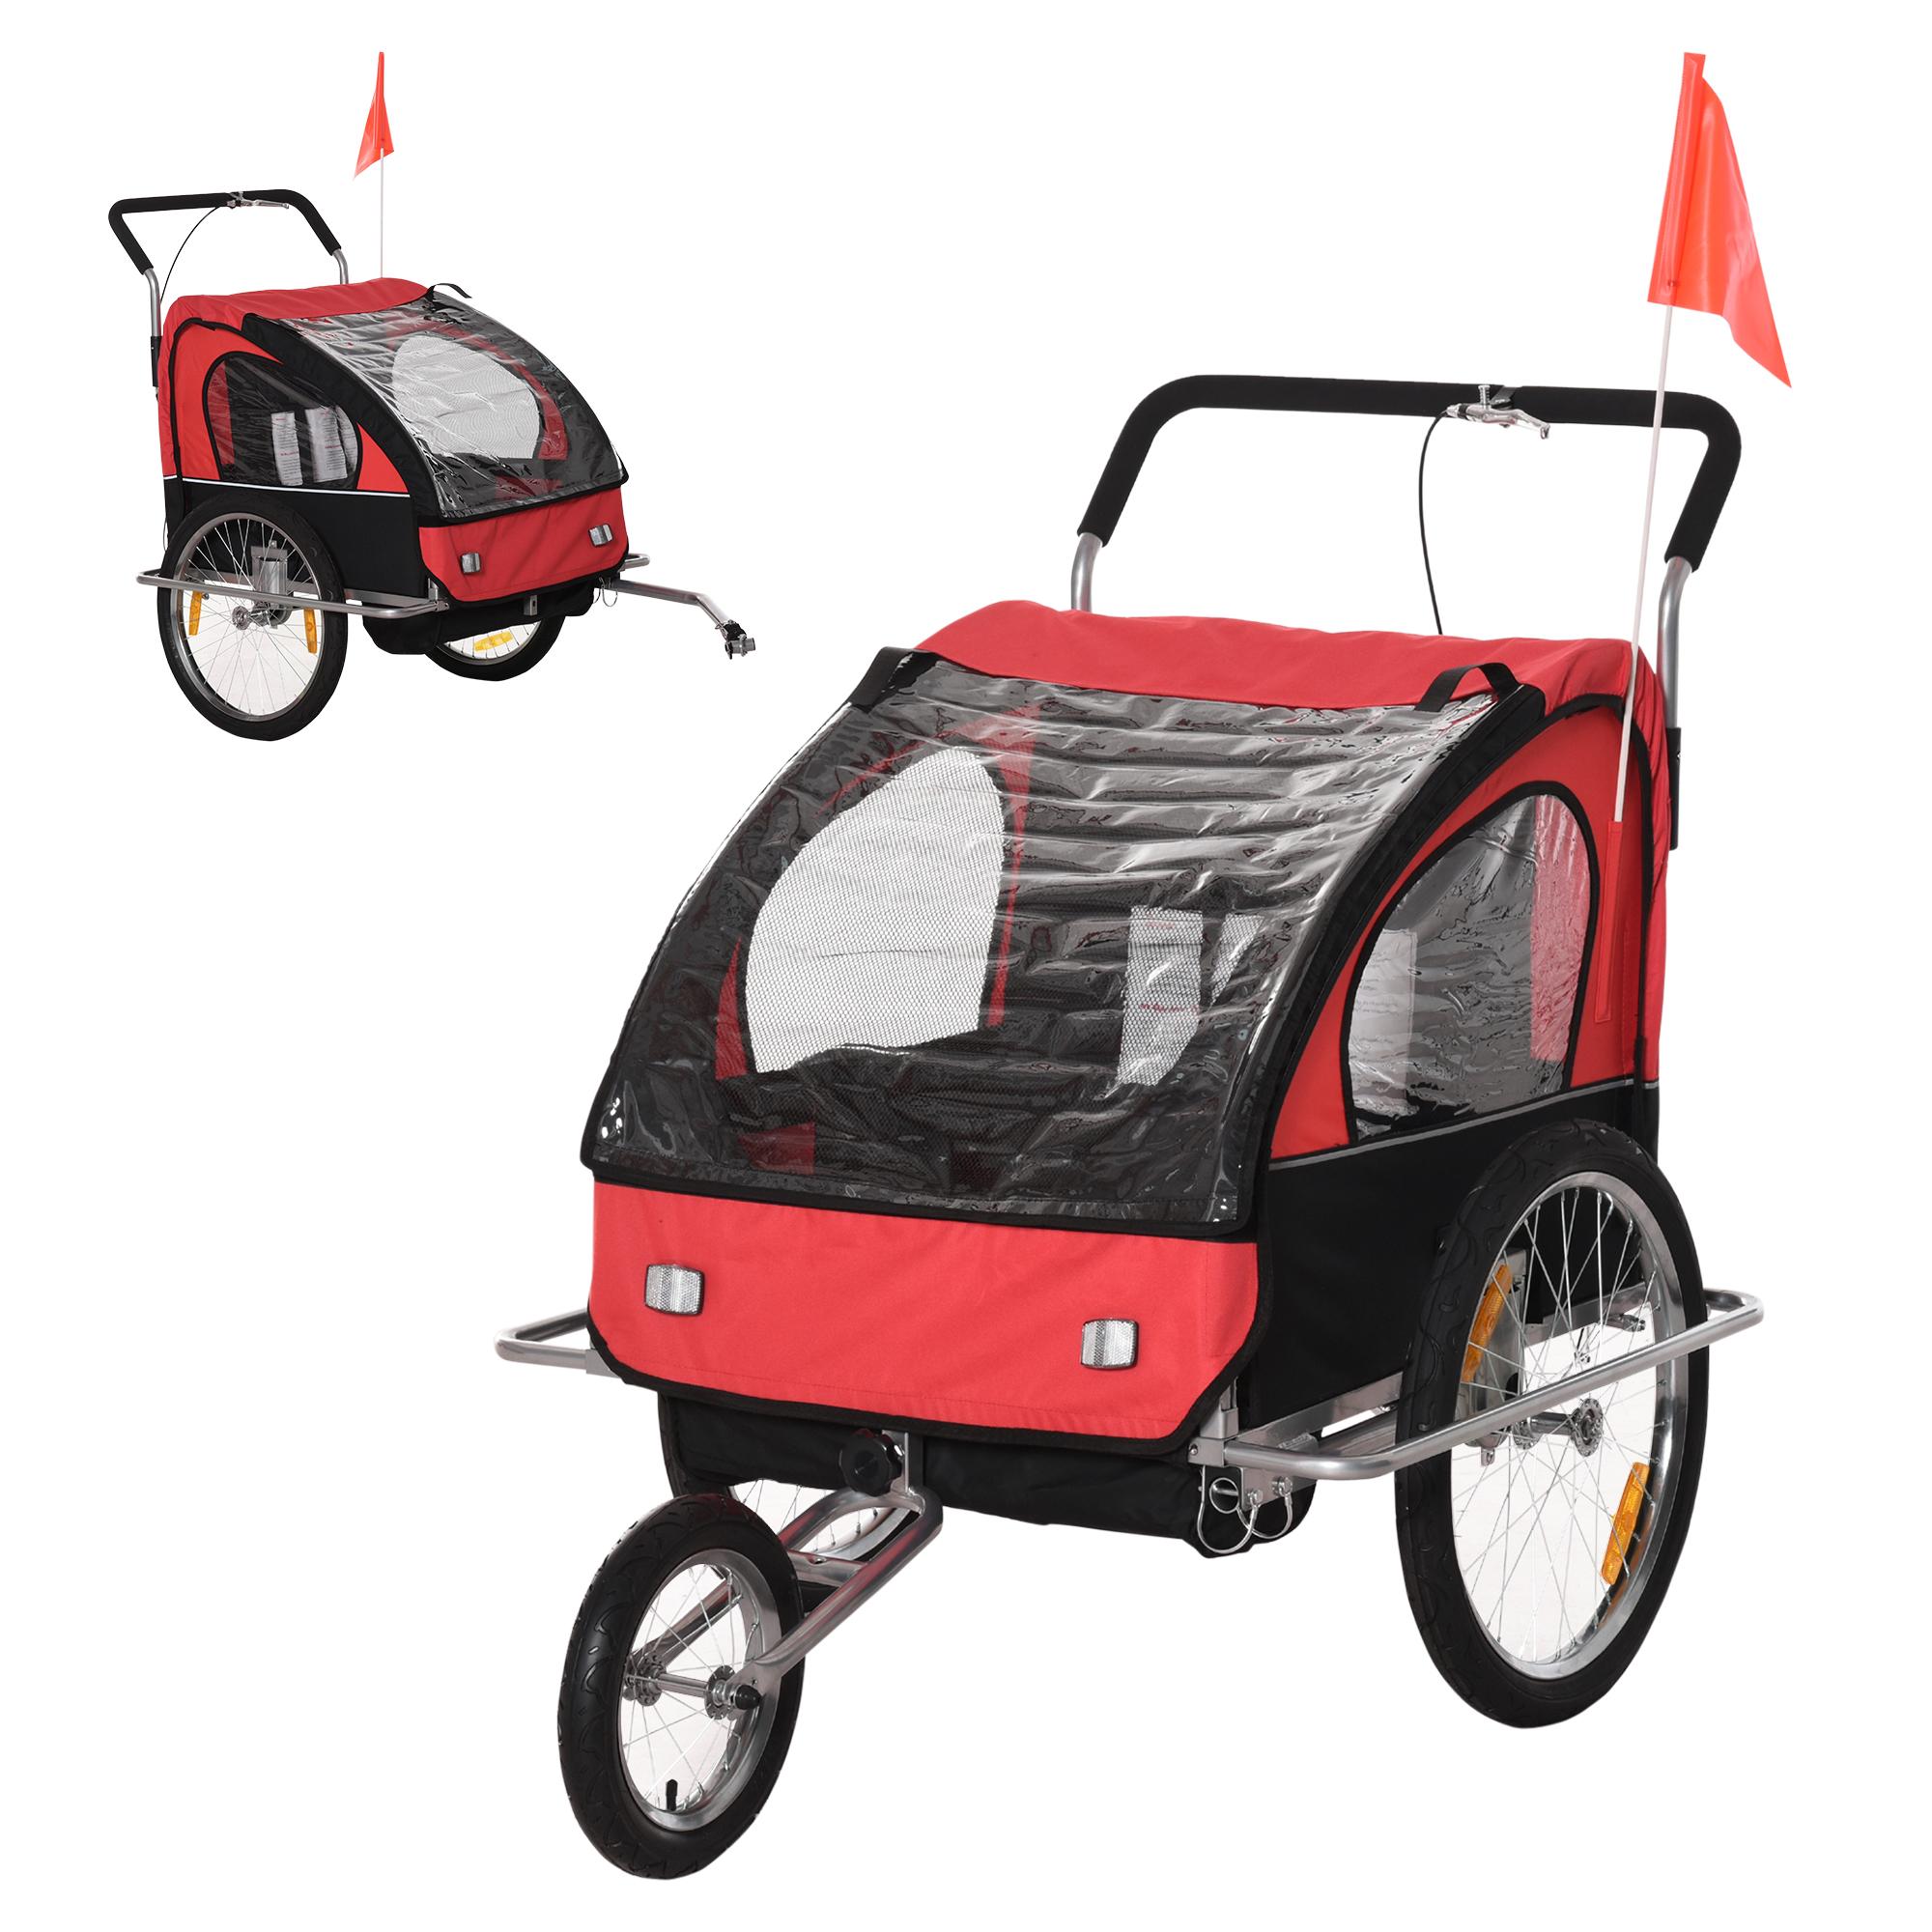 miniatura 31 - Remolque Bicicleta Niño 2 PLAZAS+Amortiguador Kit Footing Freno Bandera Cubierta